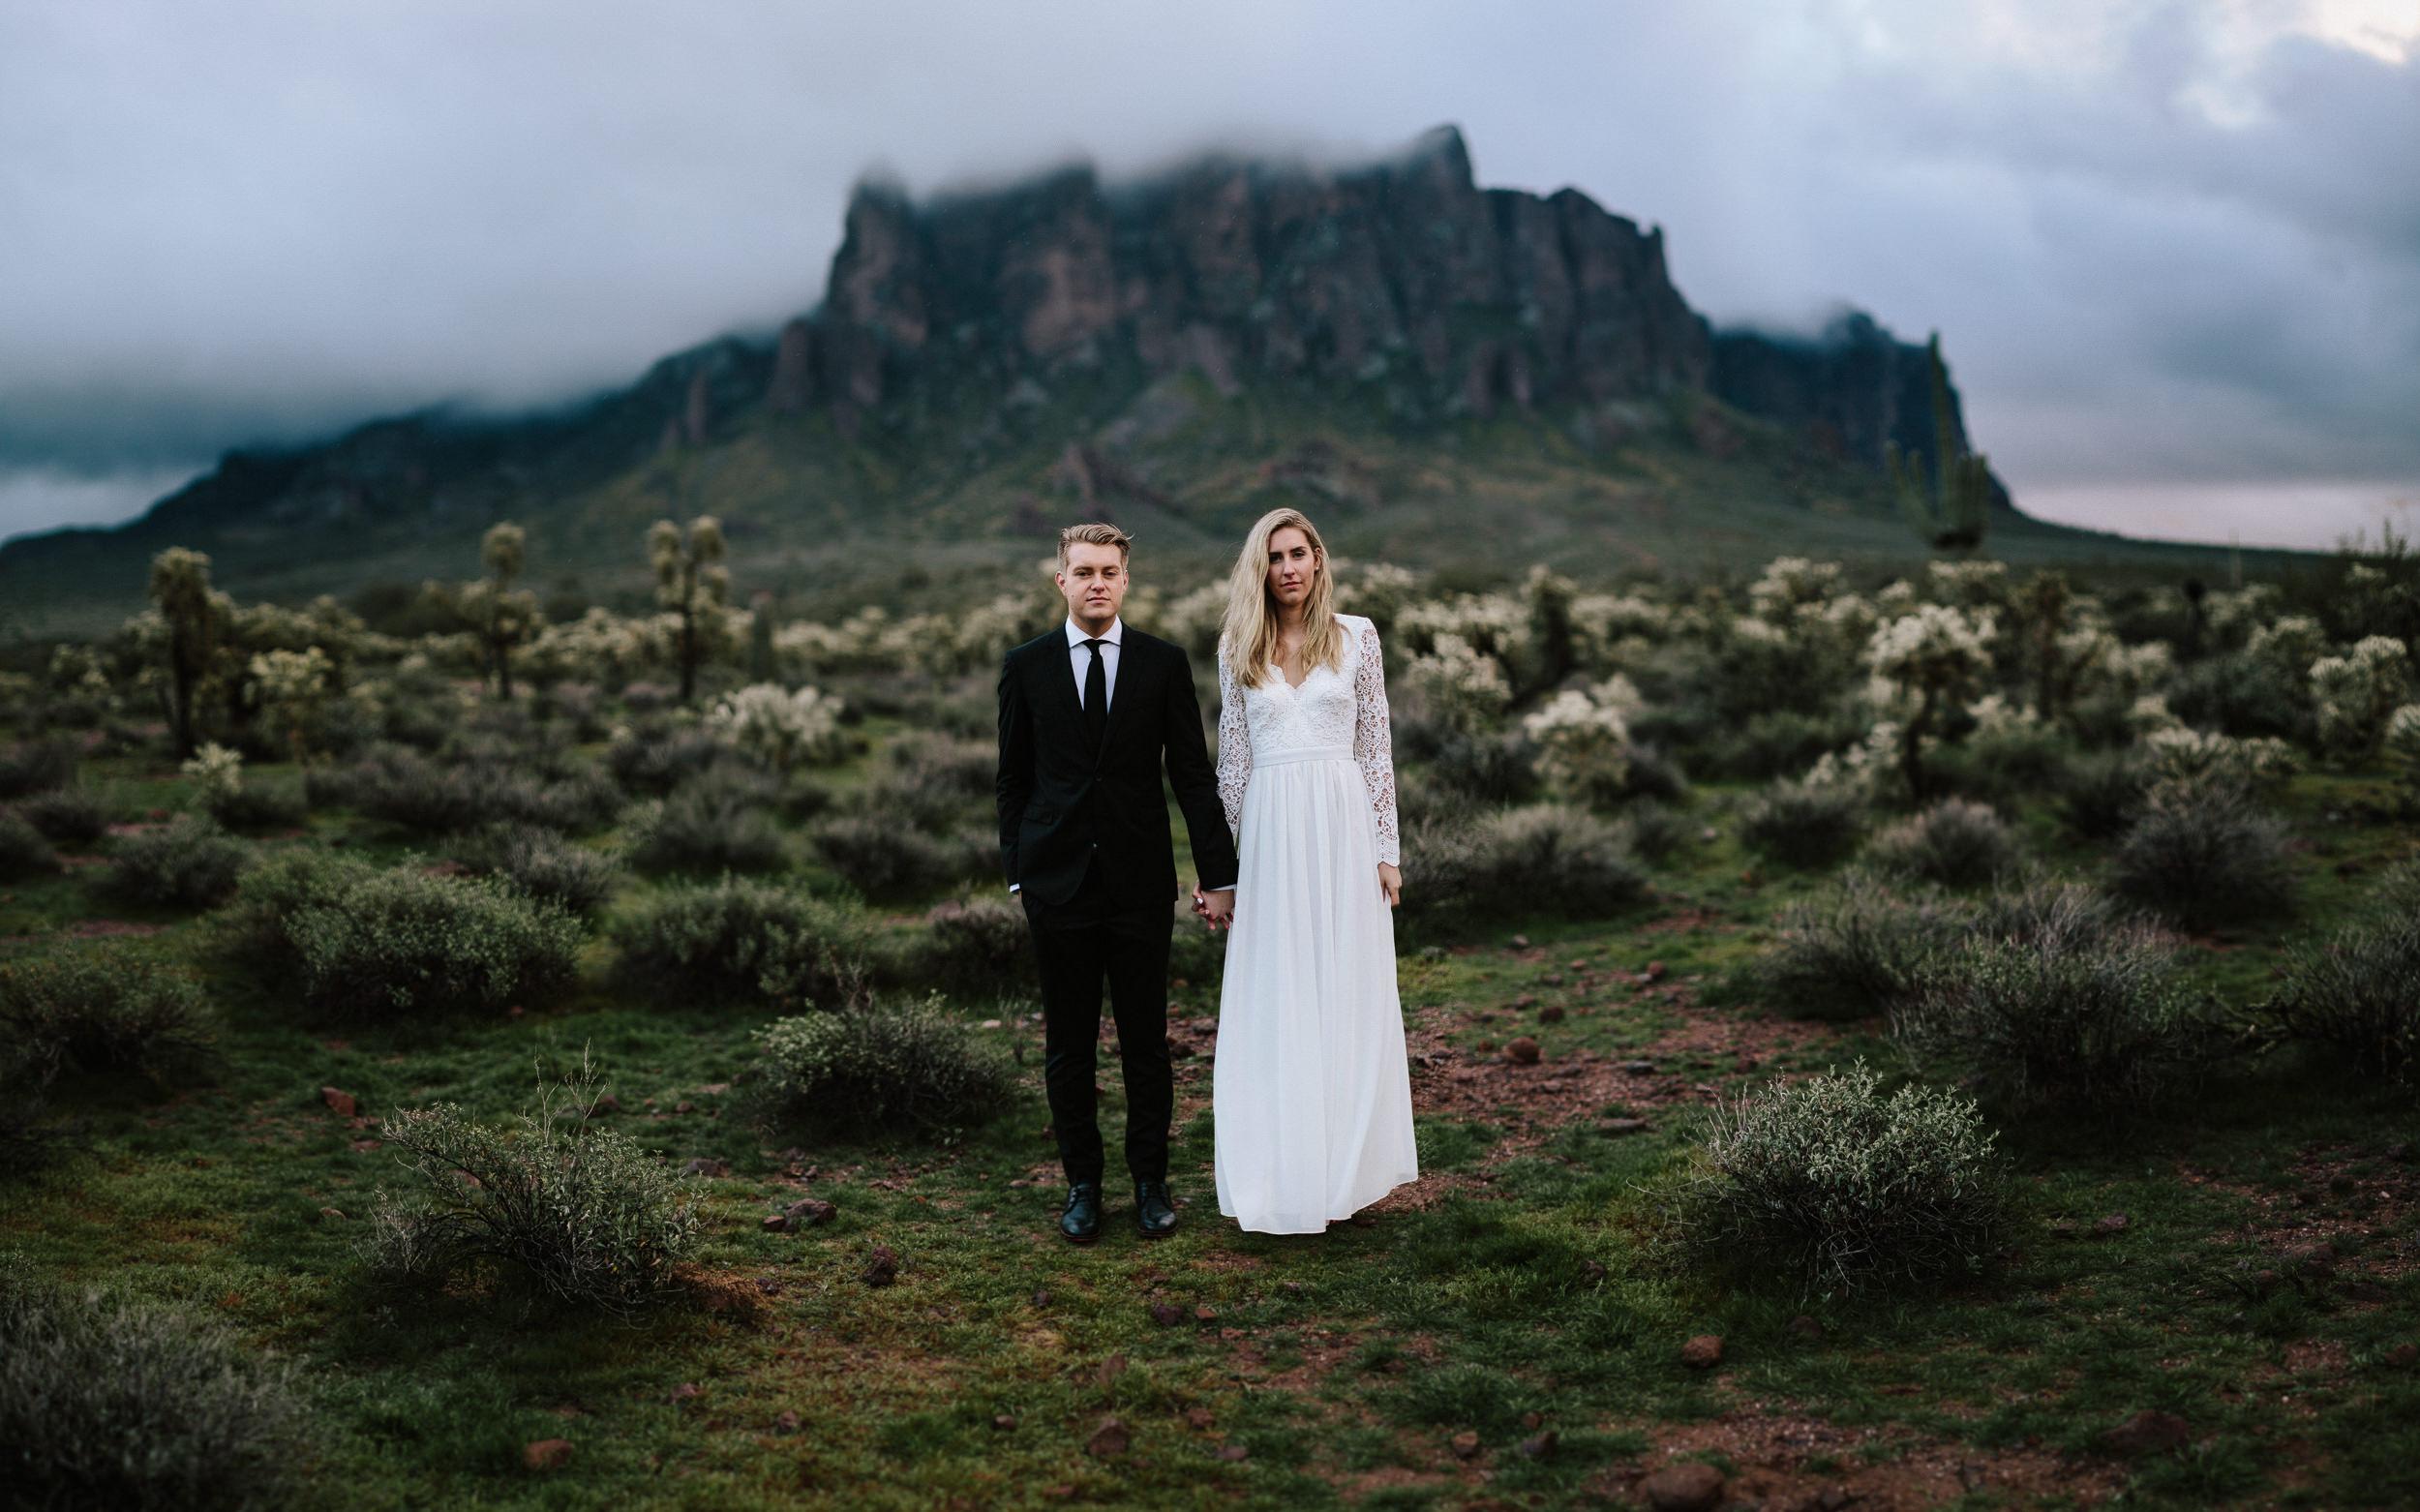 phoenix-mesa-elopement-wedding-photographer-lost-dutchman-state-park-superstitious-mountains-45.jpg